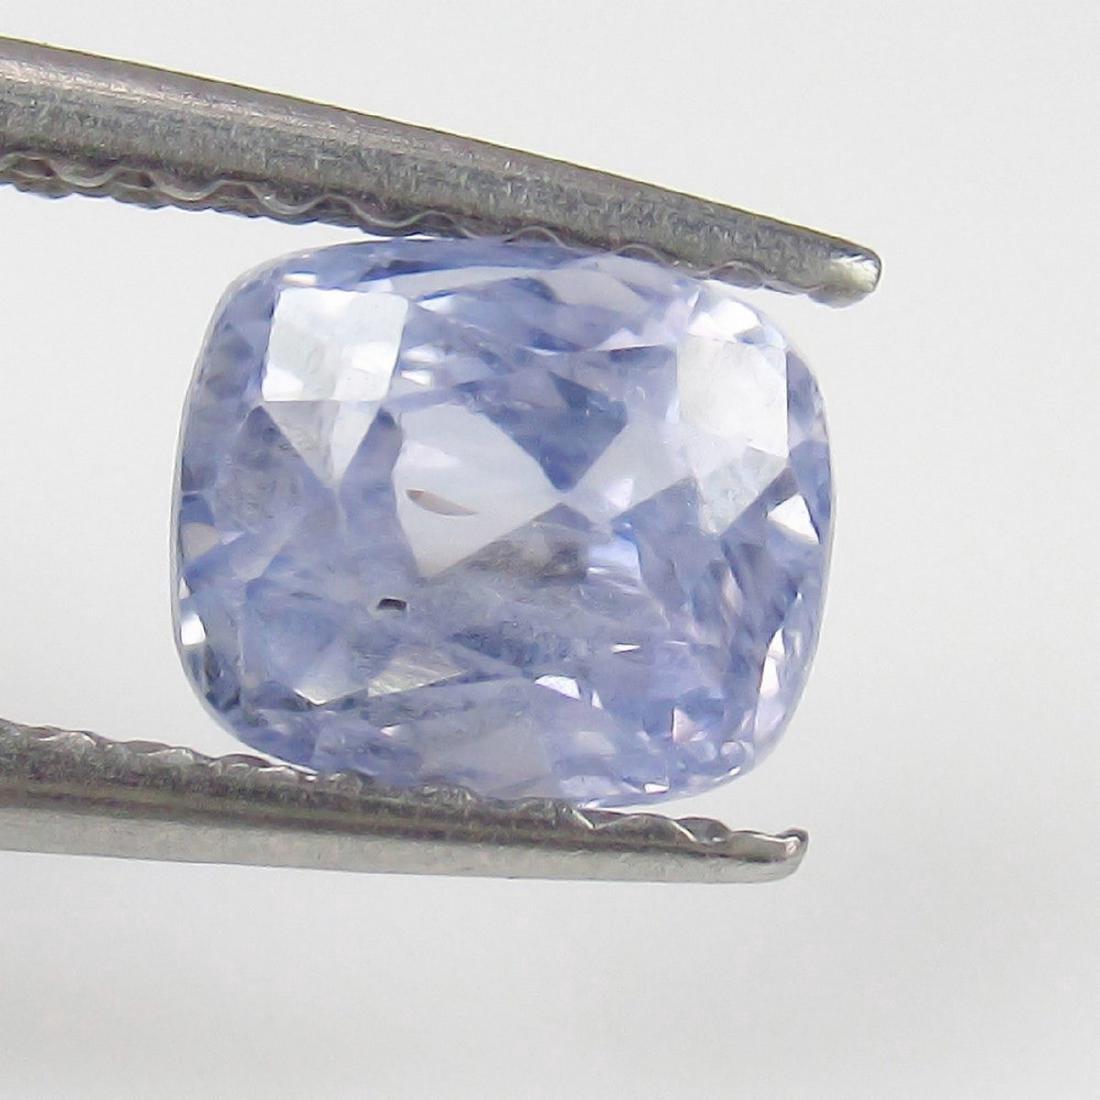 1.04 Carat Loose Blue Sapphire